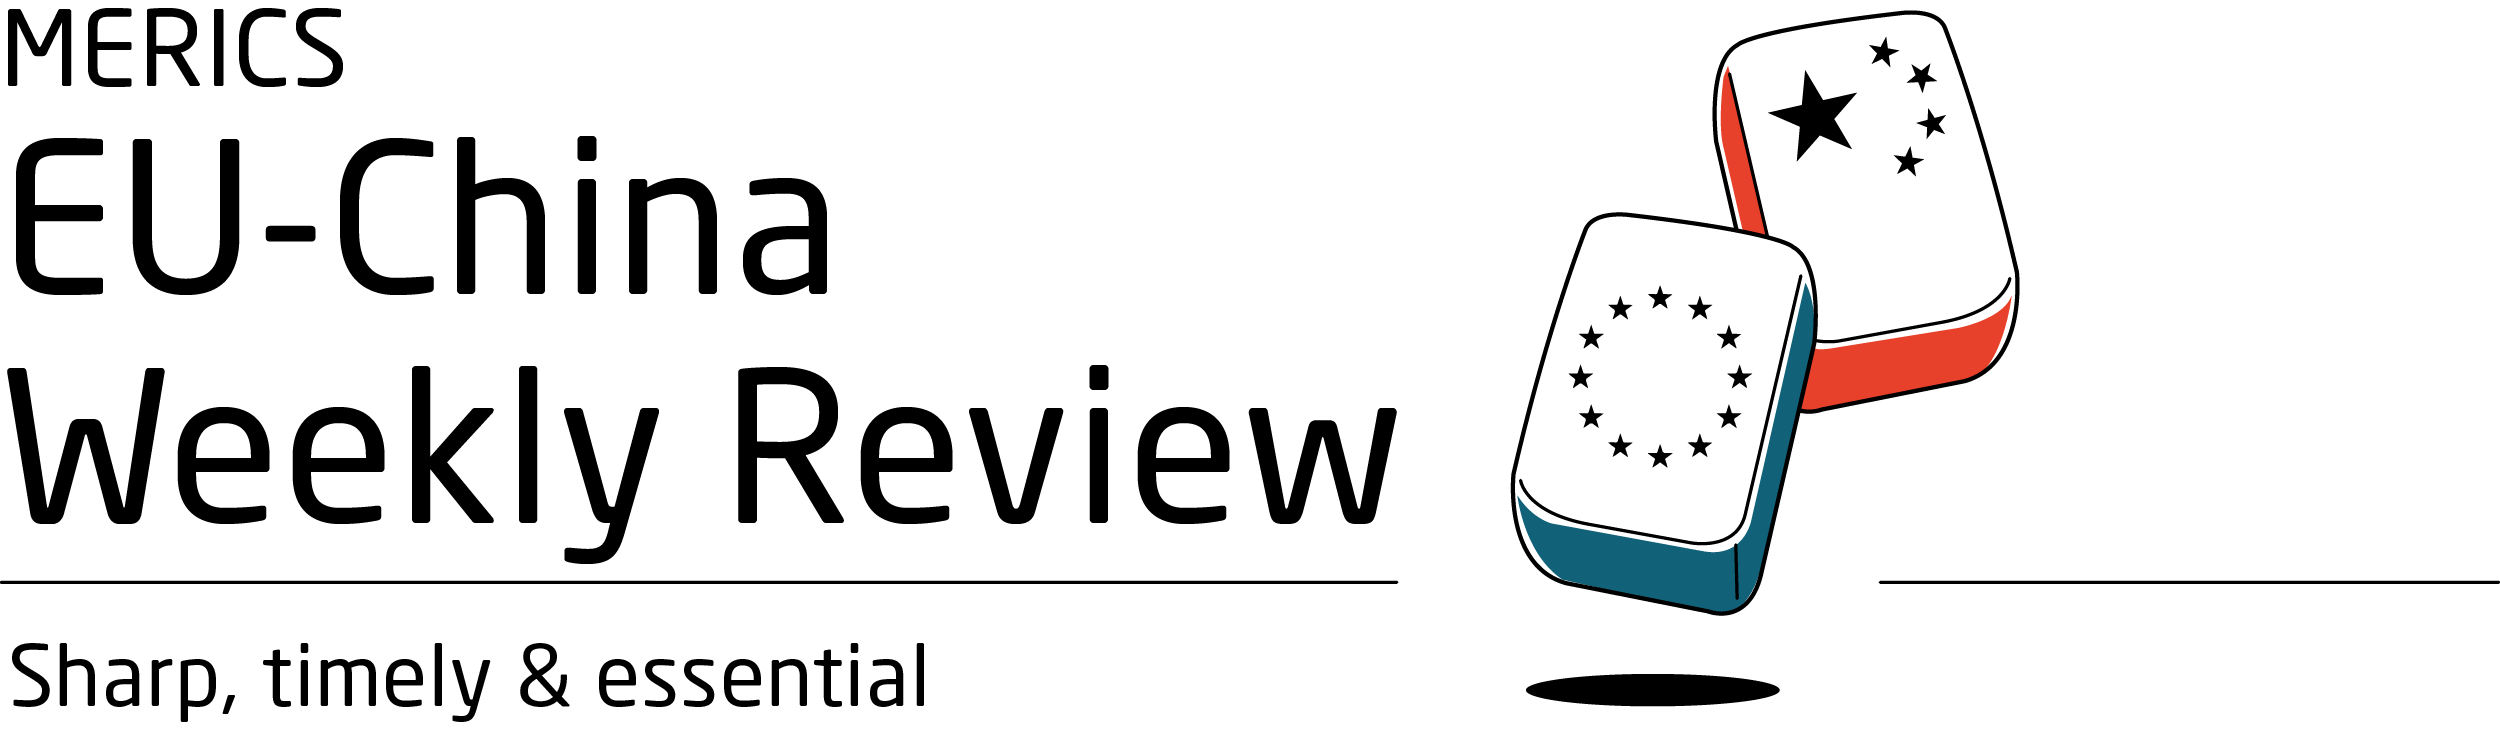 MERICS EU-China Weekly Review